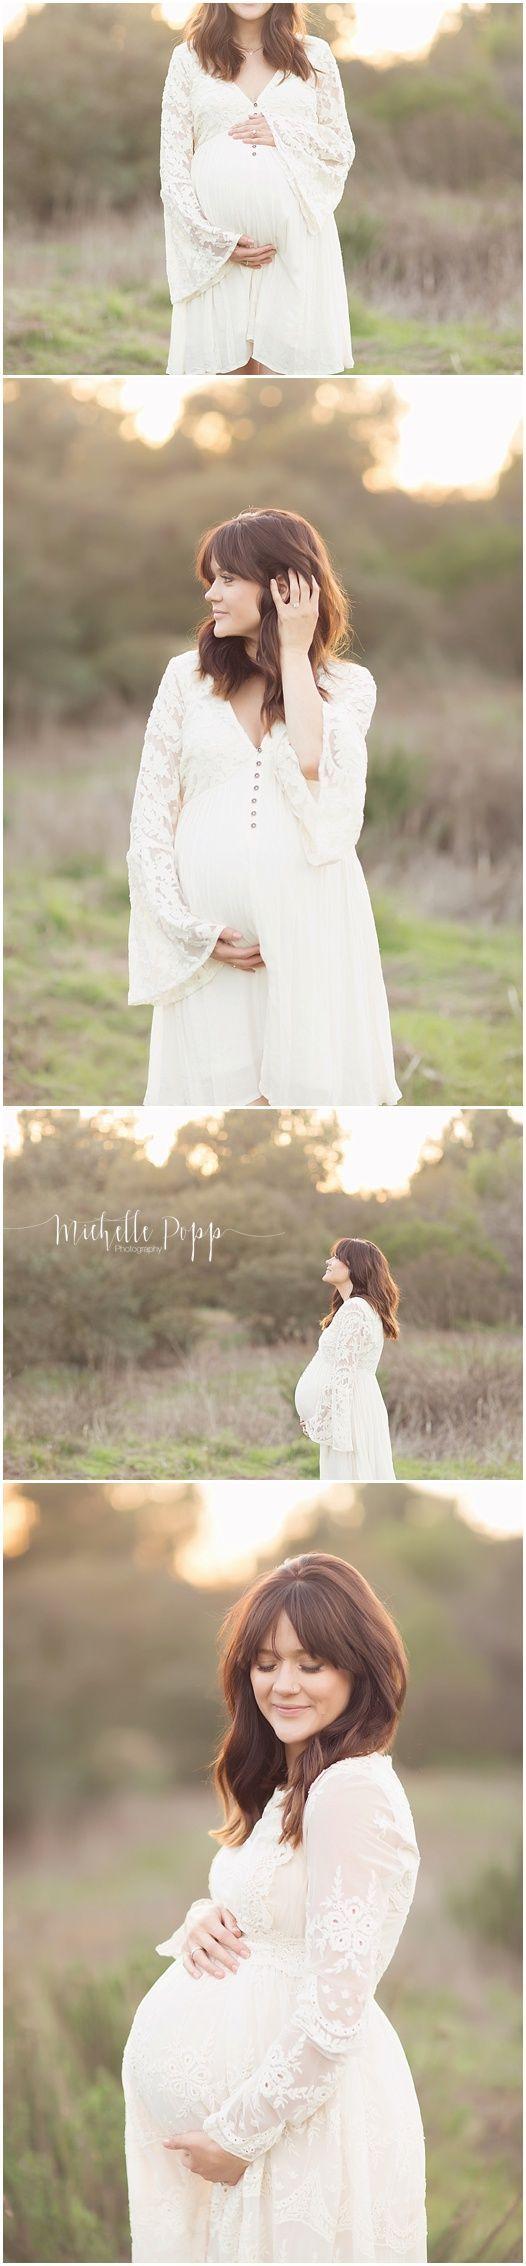 San Diego Maternity Photographer | maternity photos. field, maternity photography. #Maternity #photography